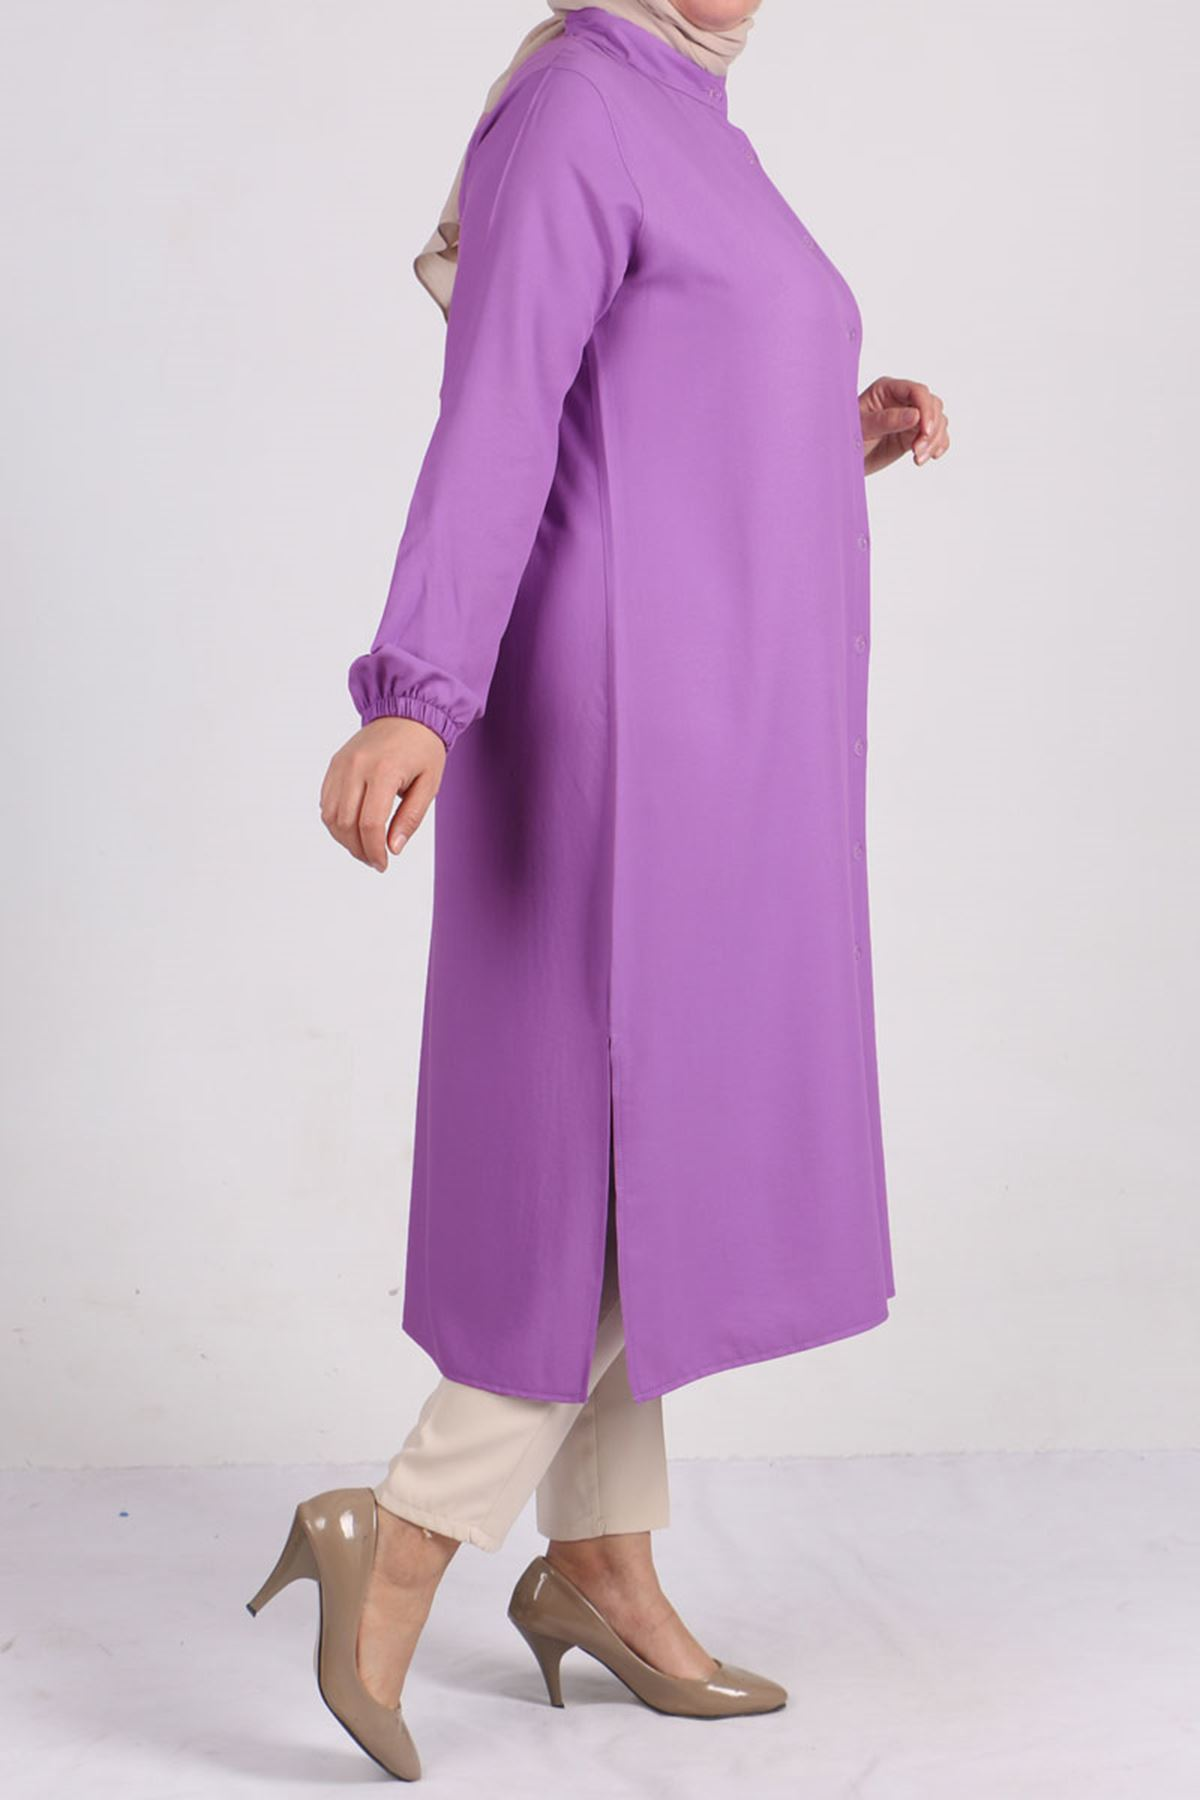 8457 Oversize Tunic- Lilac